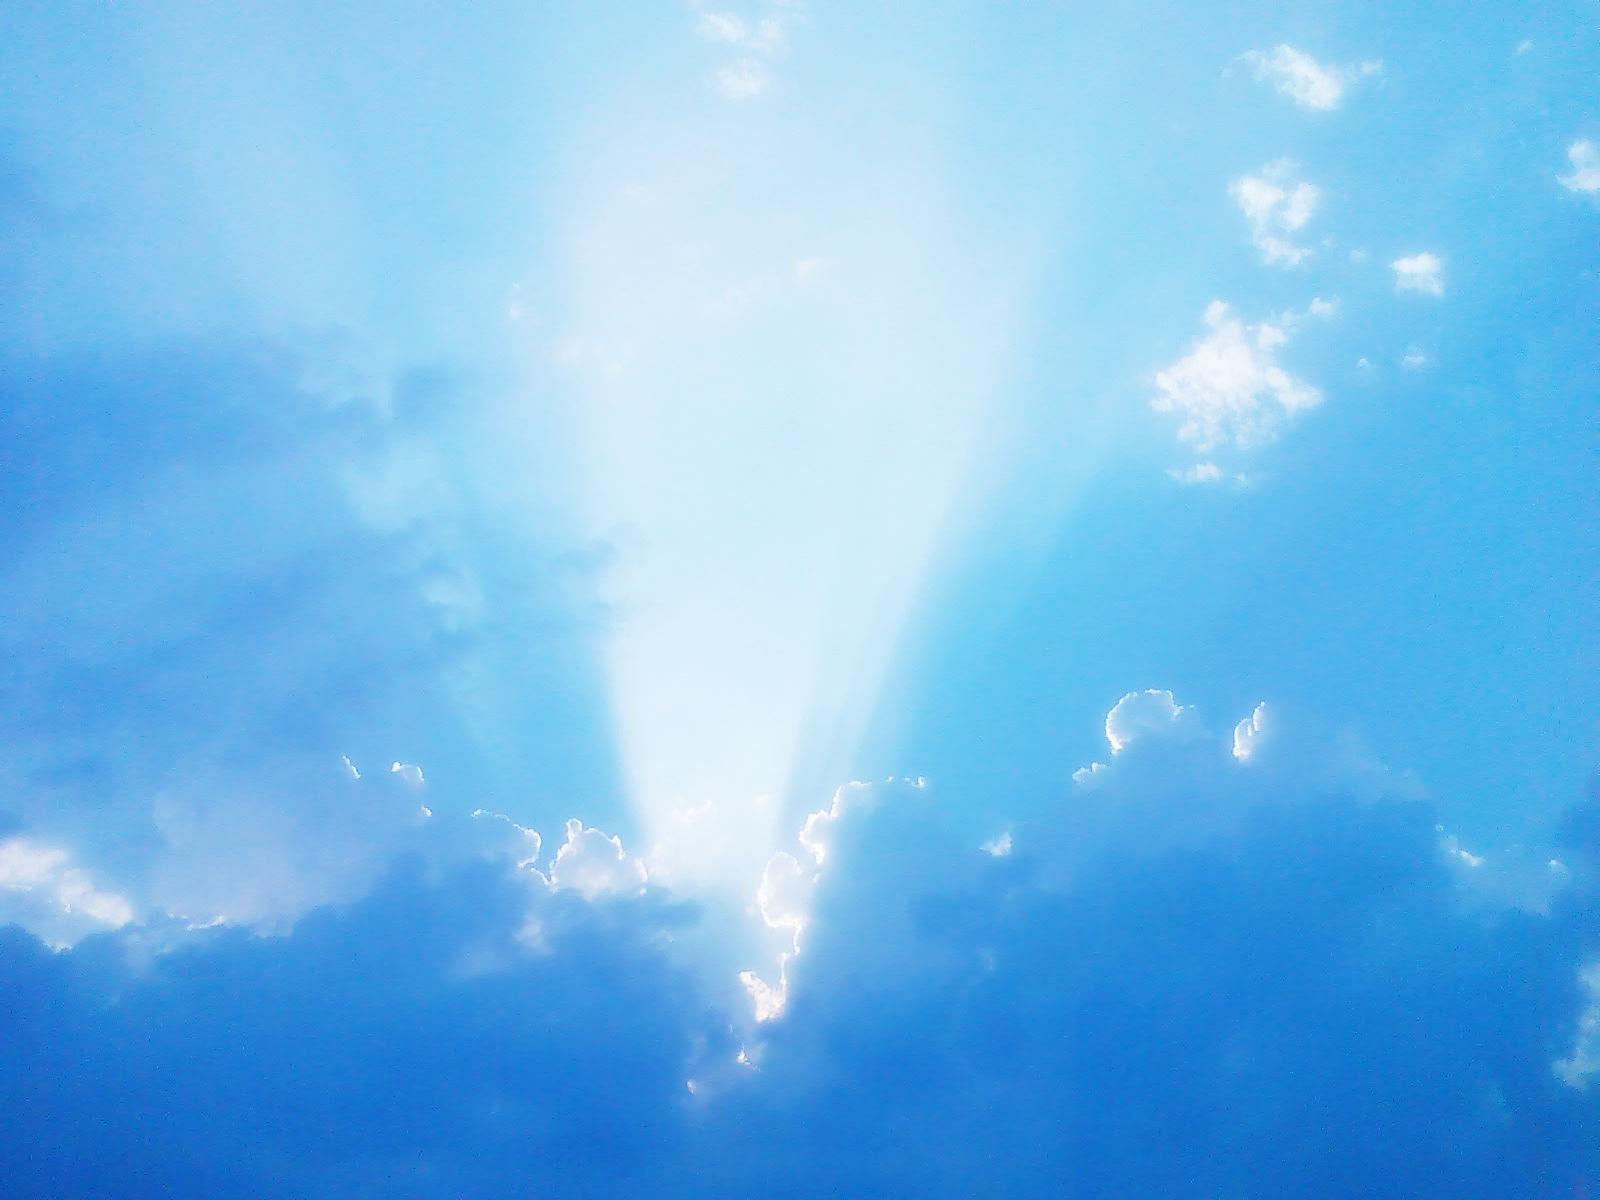 Sky-blue-heaven Picture